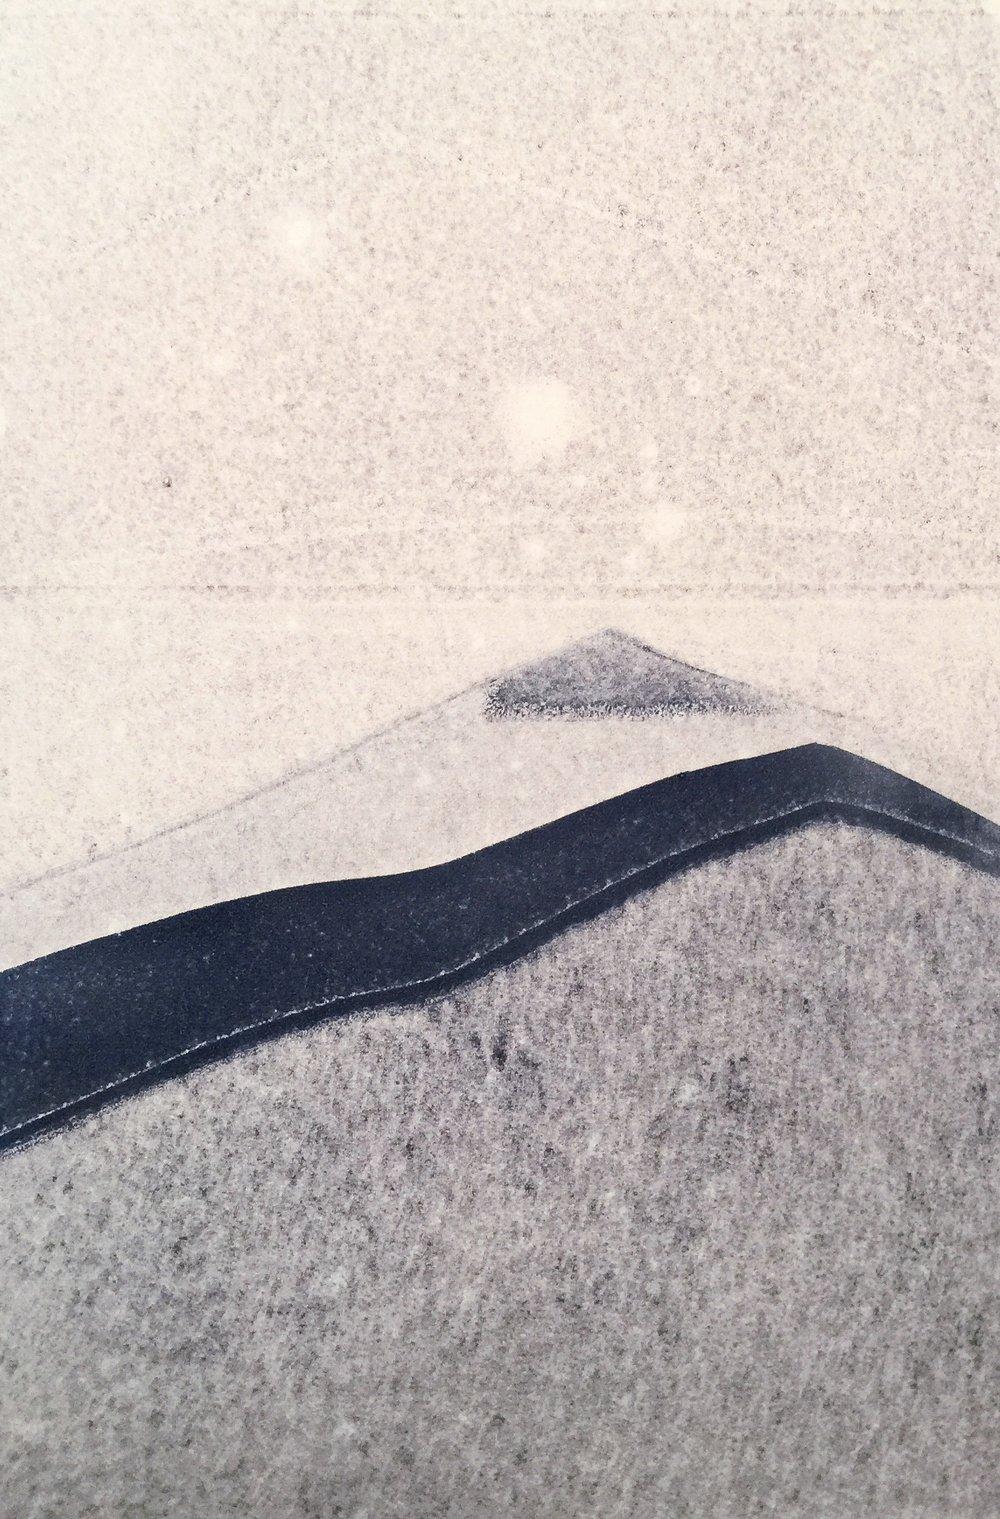 Monotype, 15 x 11 paper size, 2017